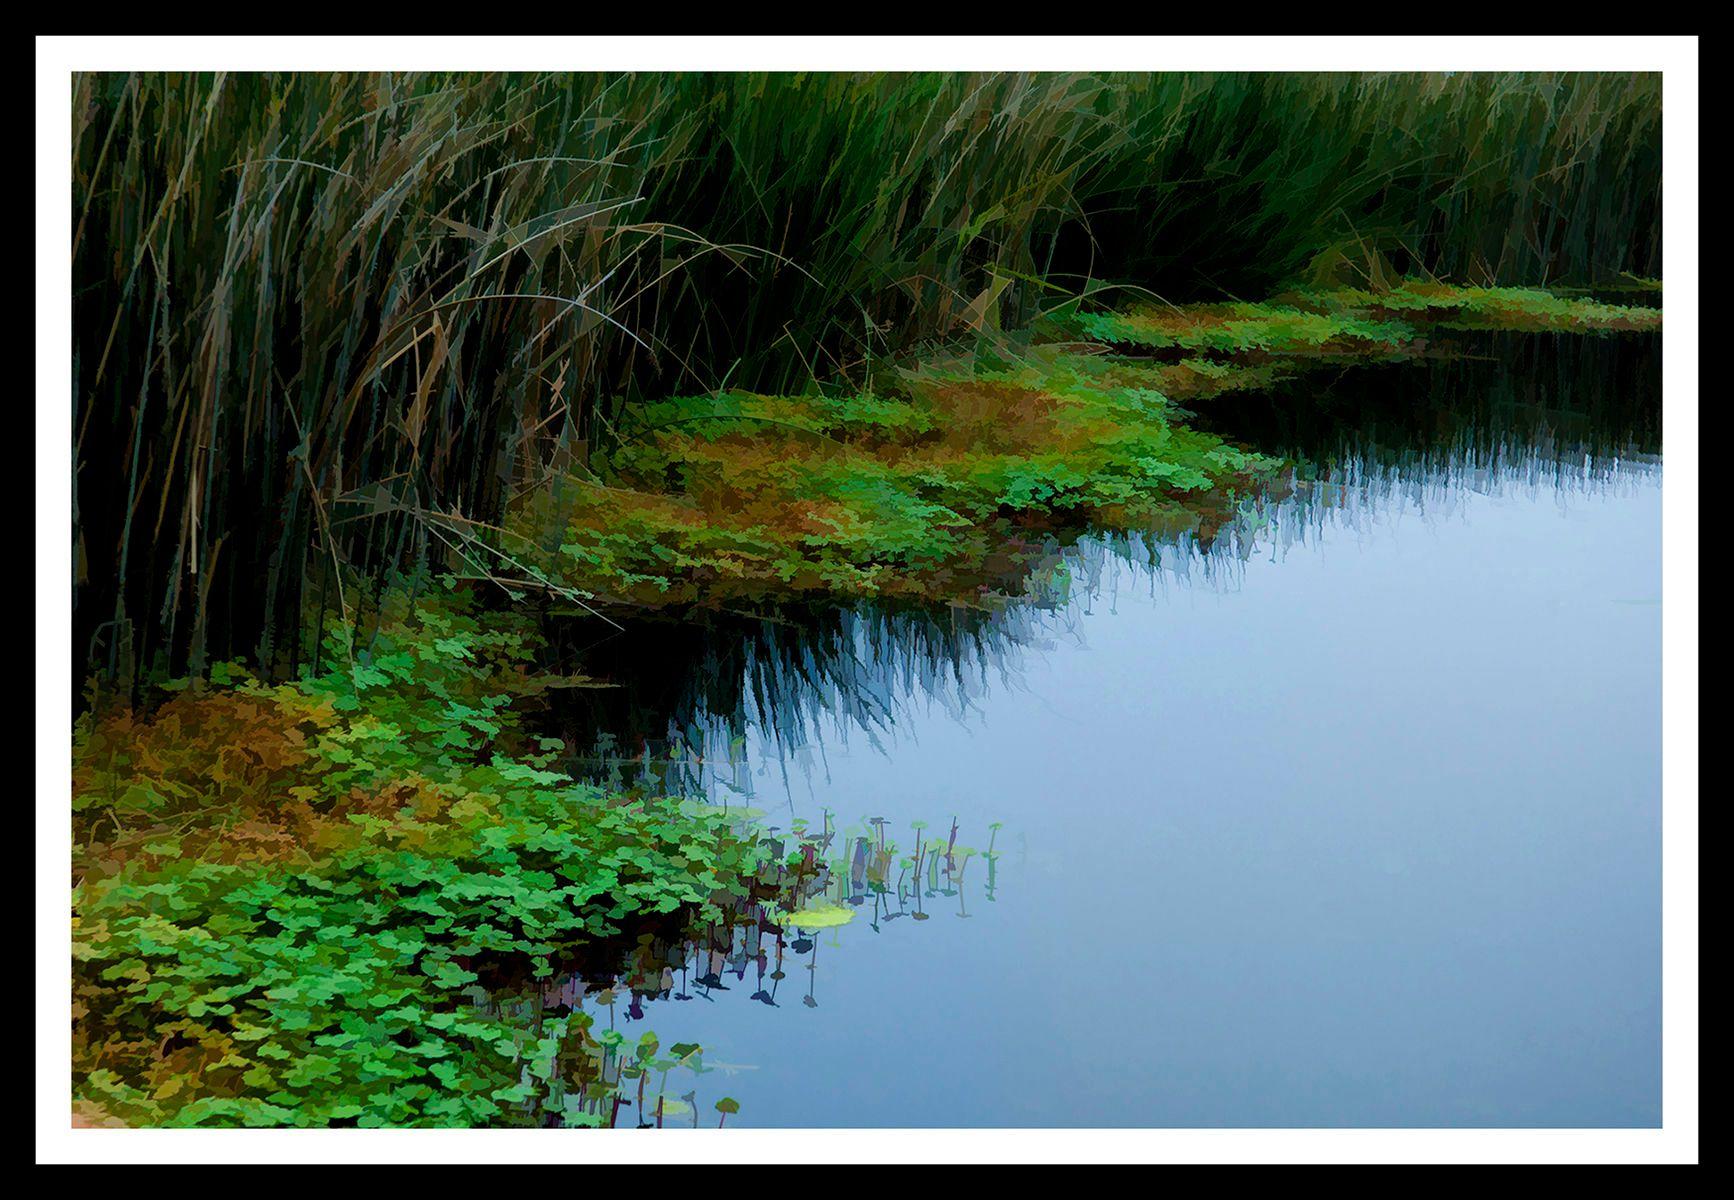 1half_moon_golf_reeds_painting_1.jpg